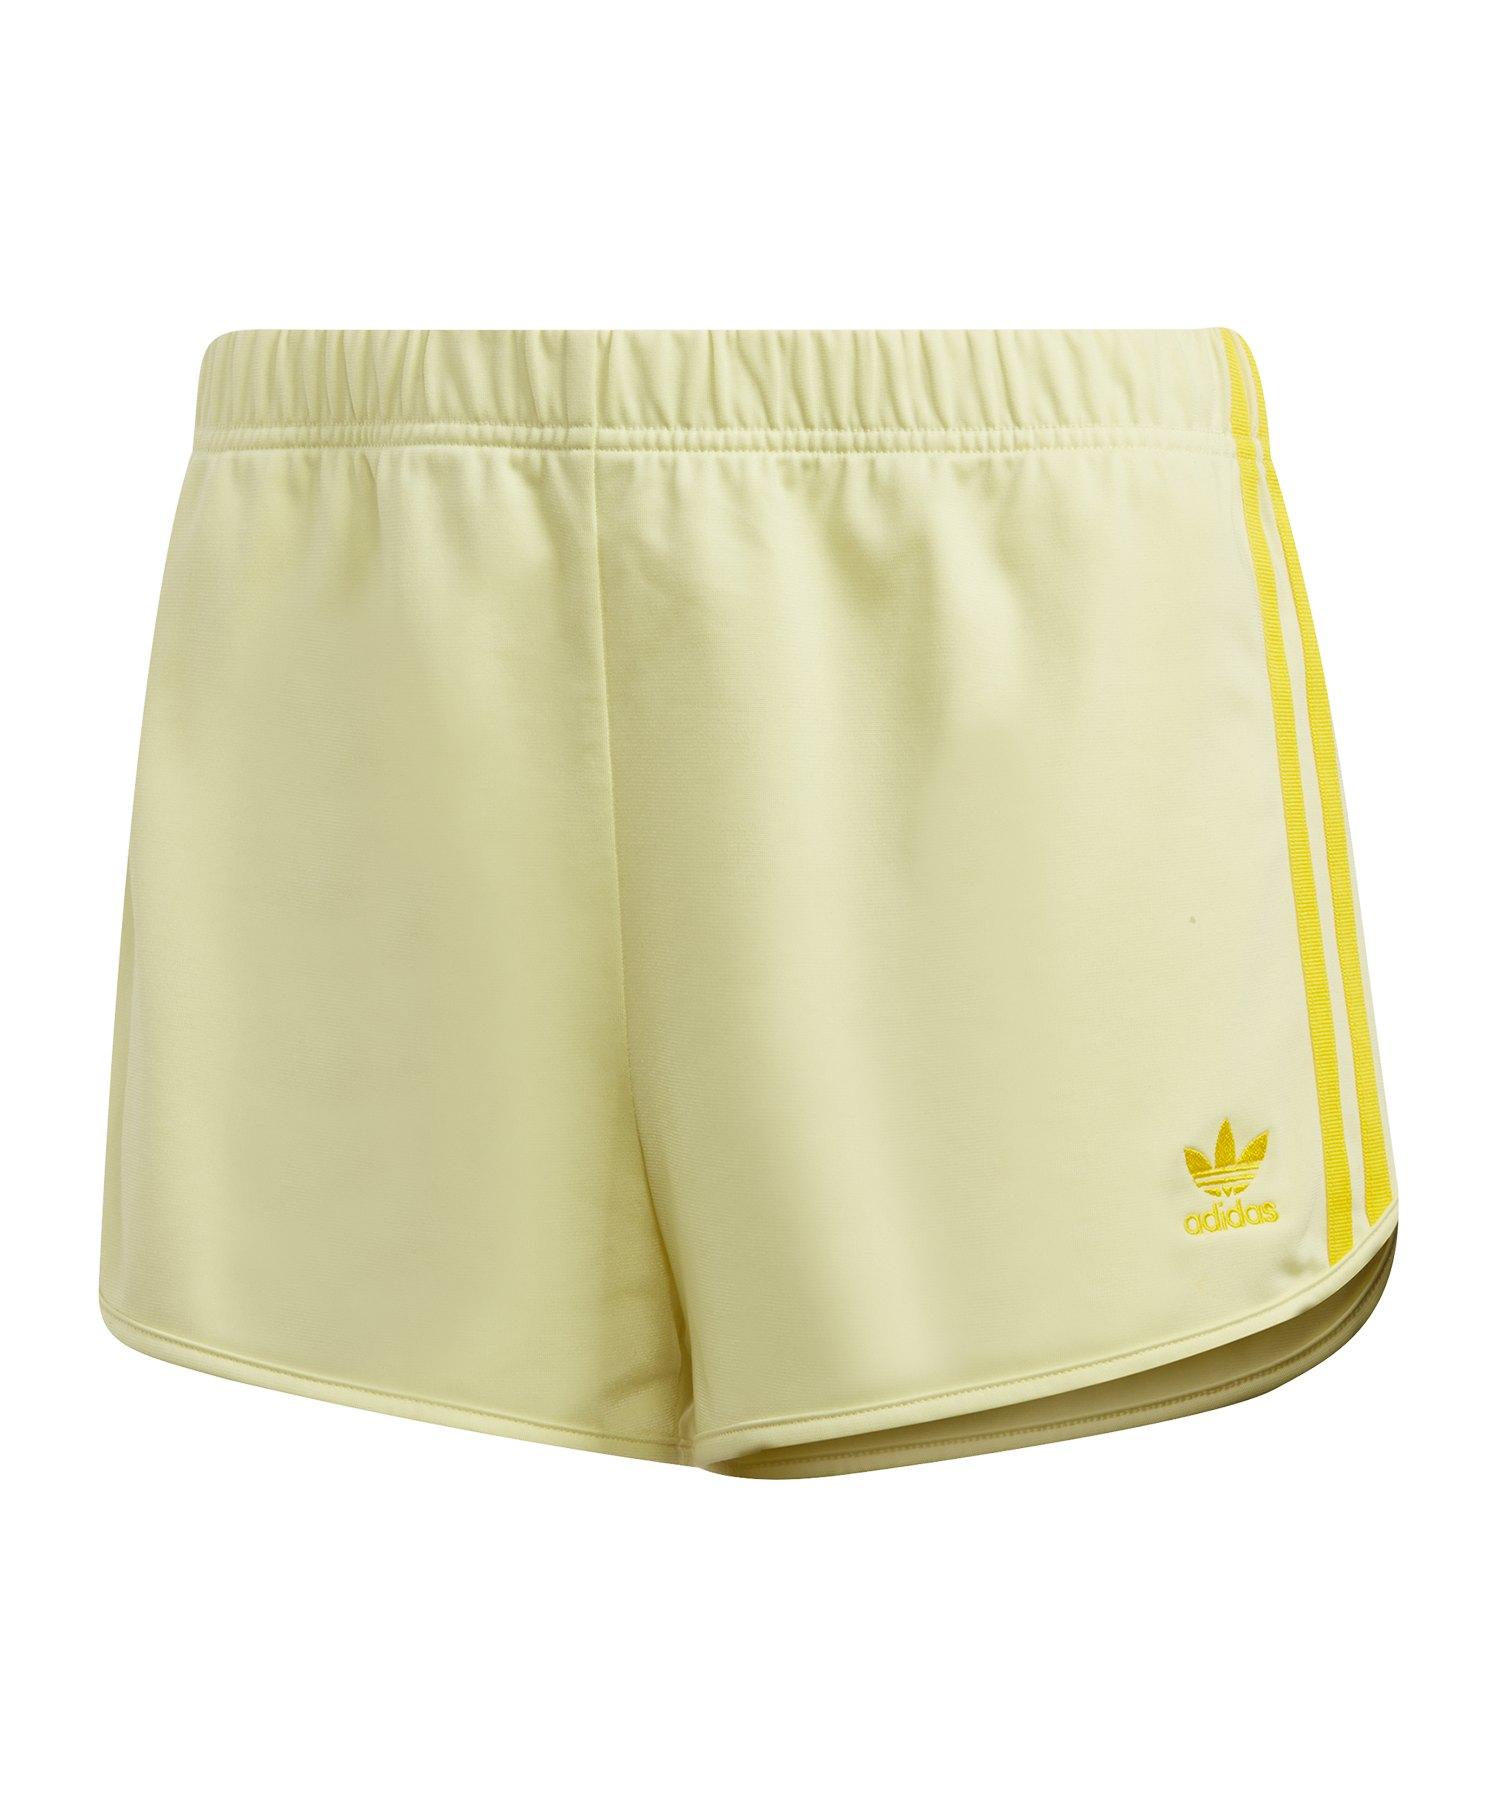 preiswert adidas Originals Football Poly Kurze Hose Gelb